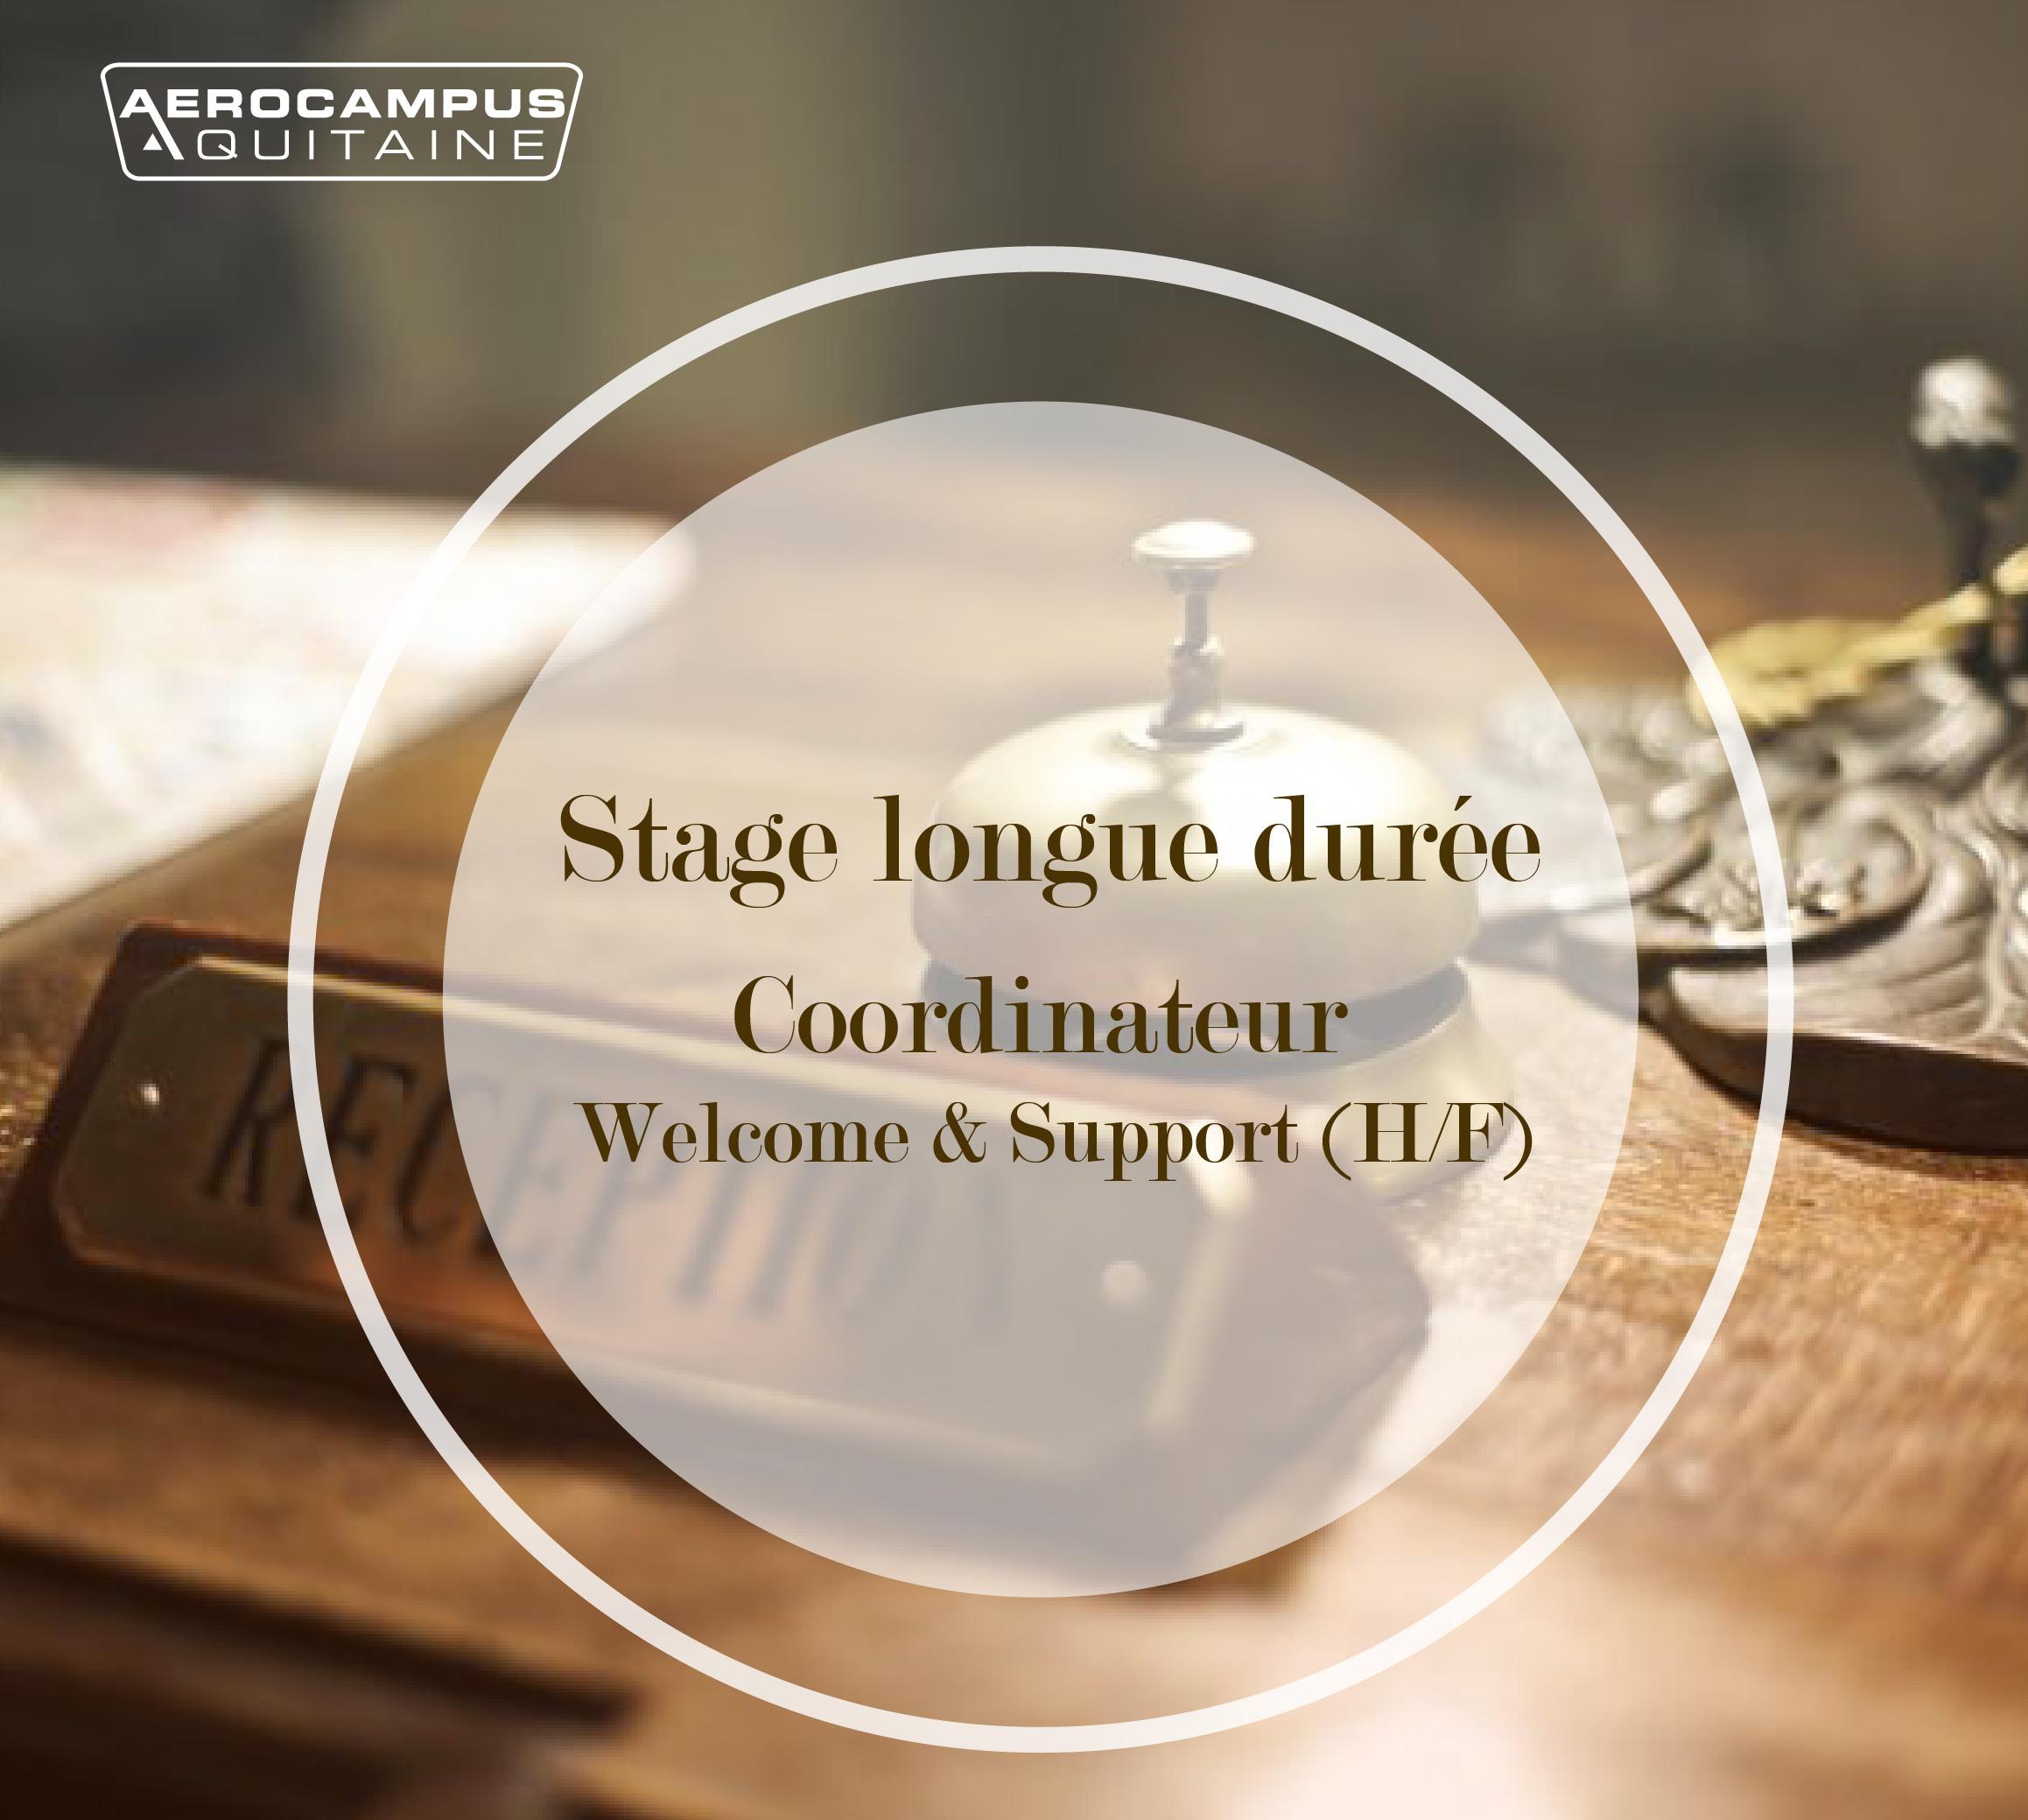 COORDINATEUR WELCOME & SUPPORT (H/F) – STAGE LONGUE DURÉE